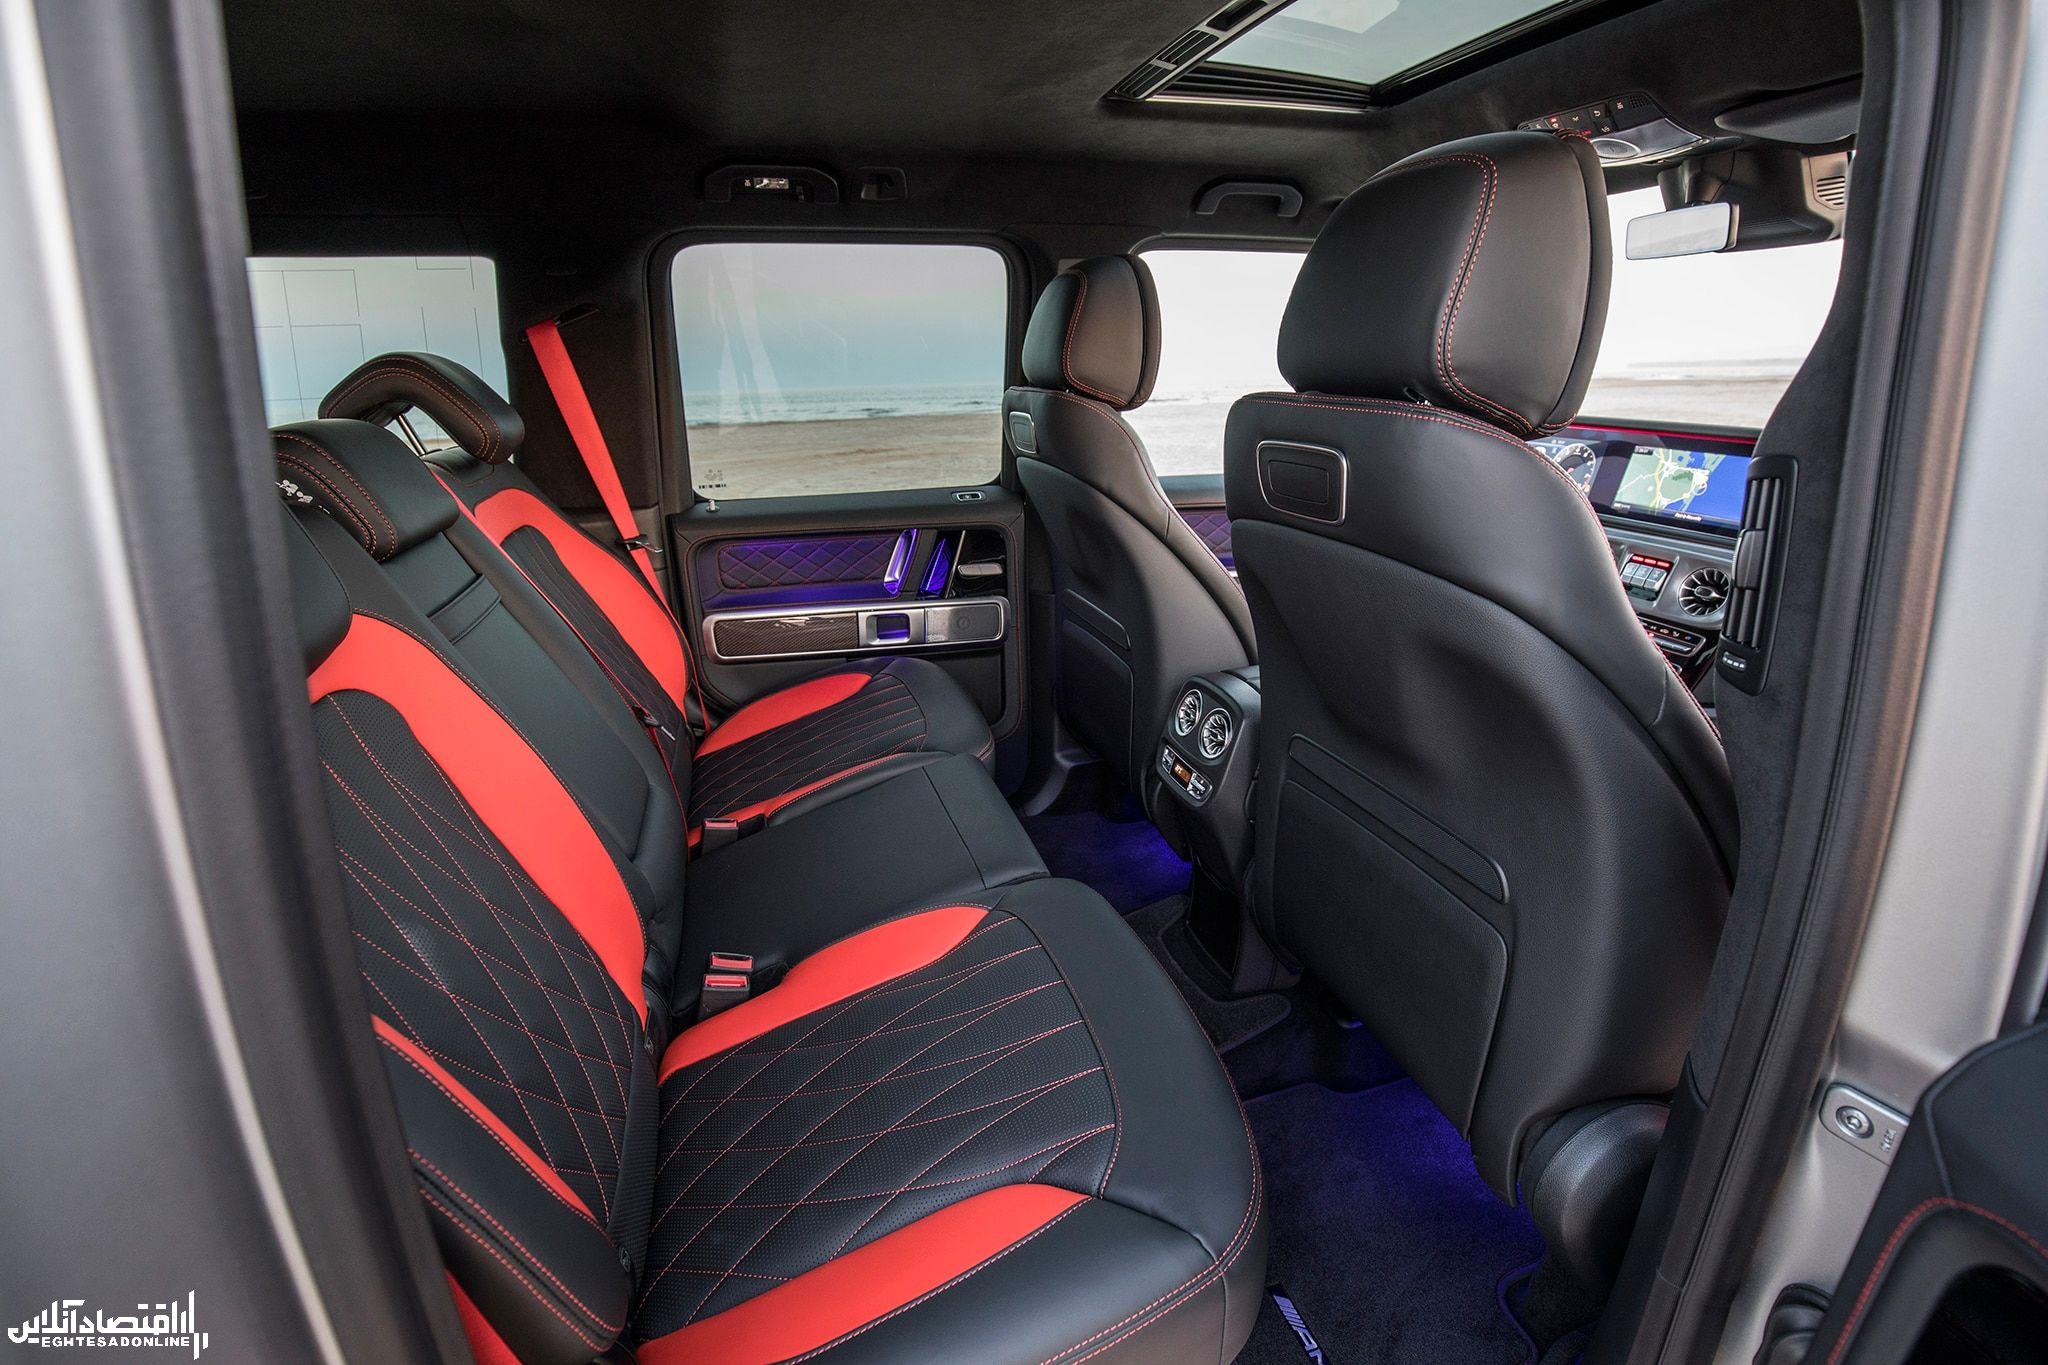 2019-Mercedes-AMG-G63-106